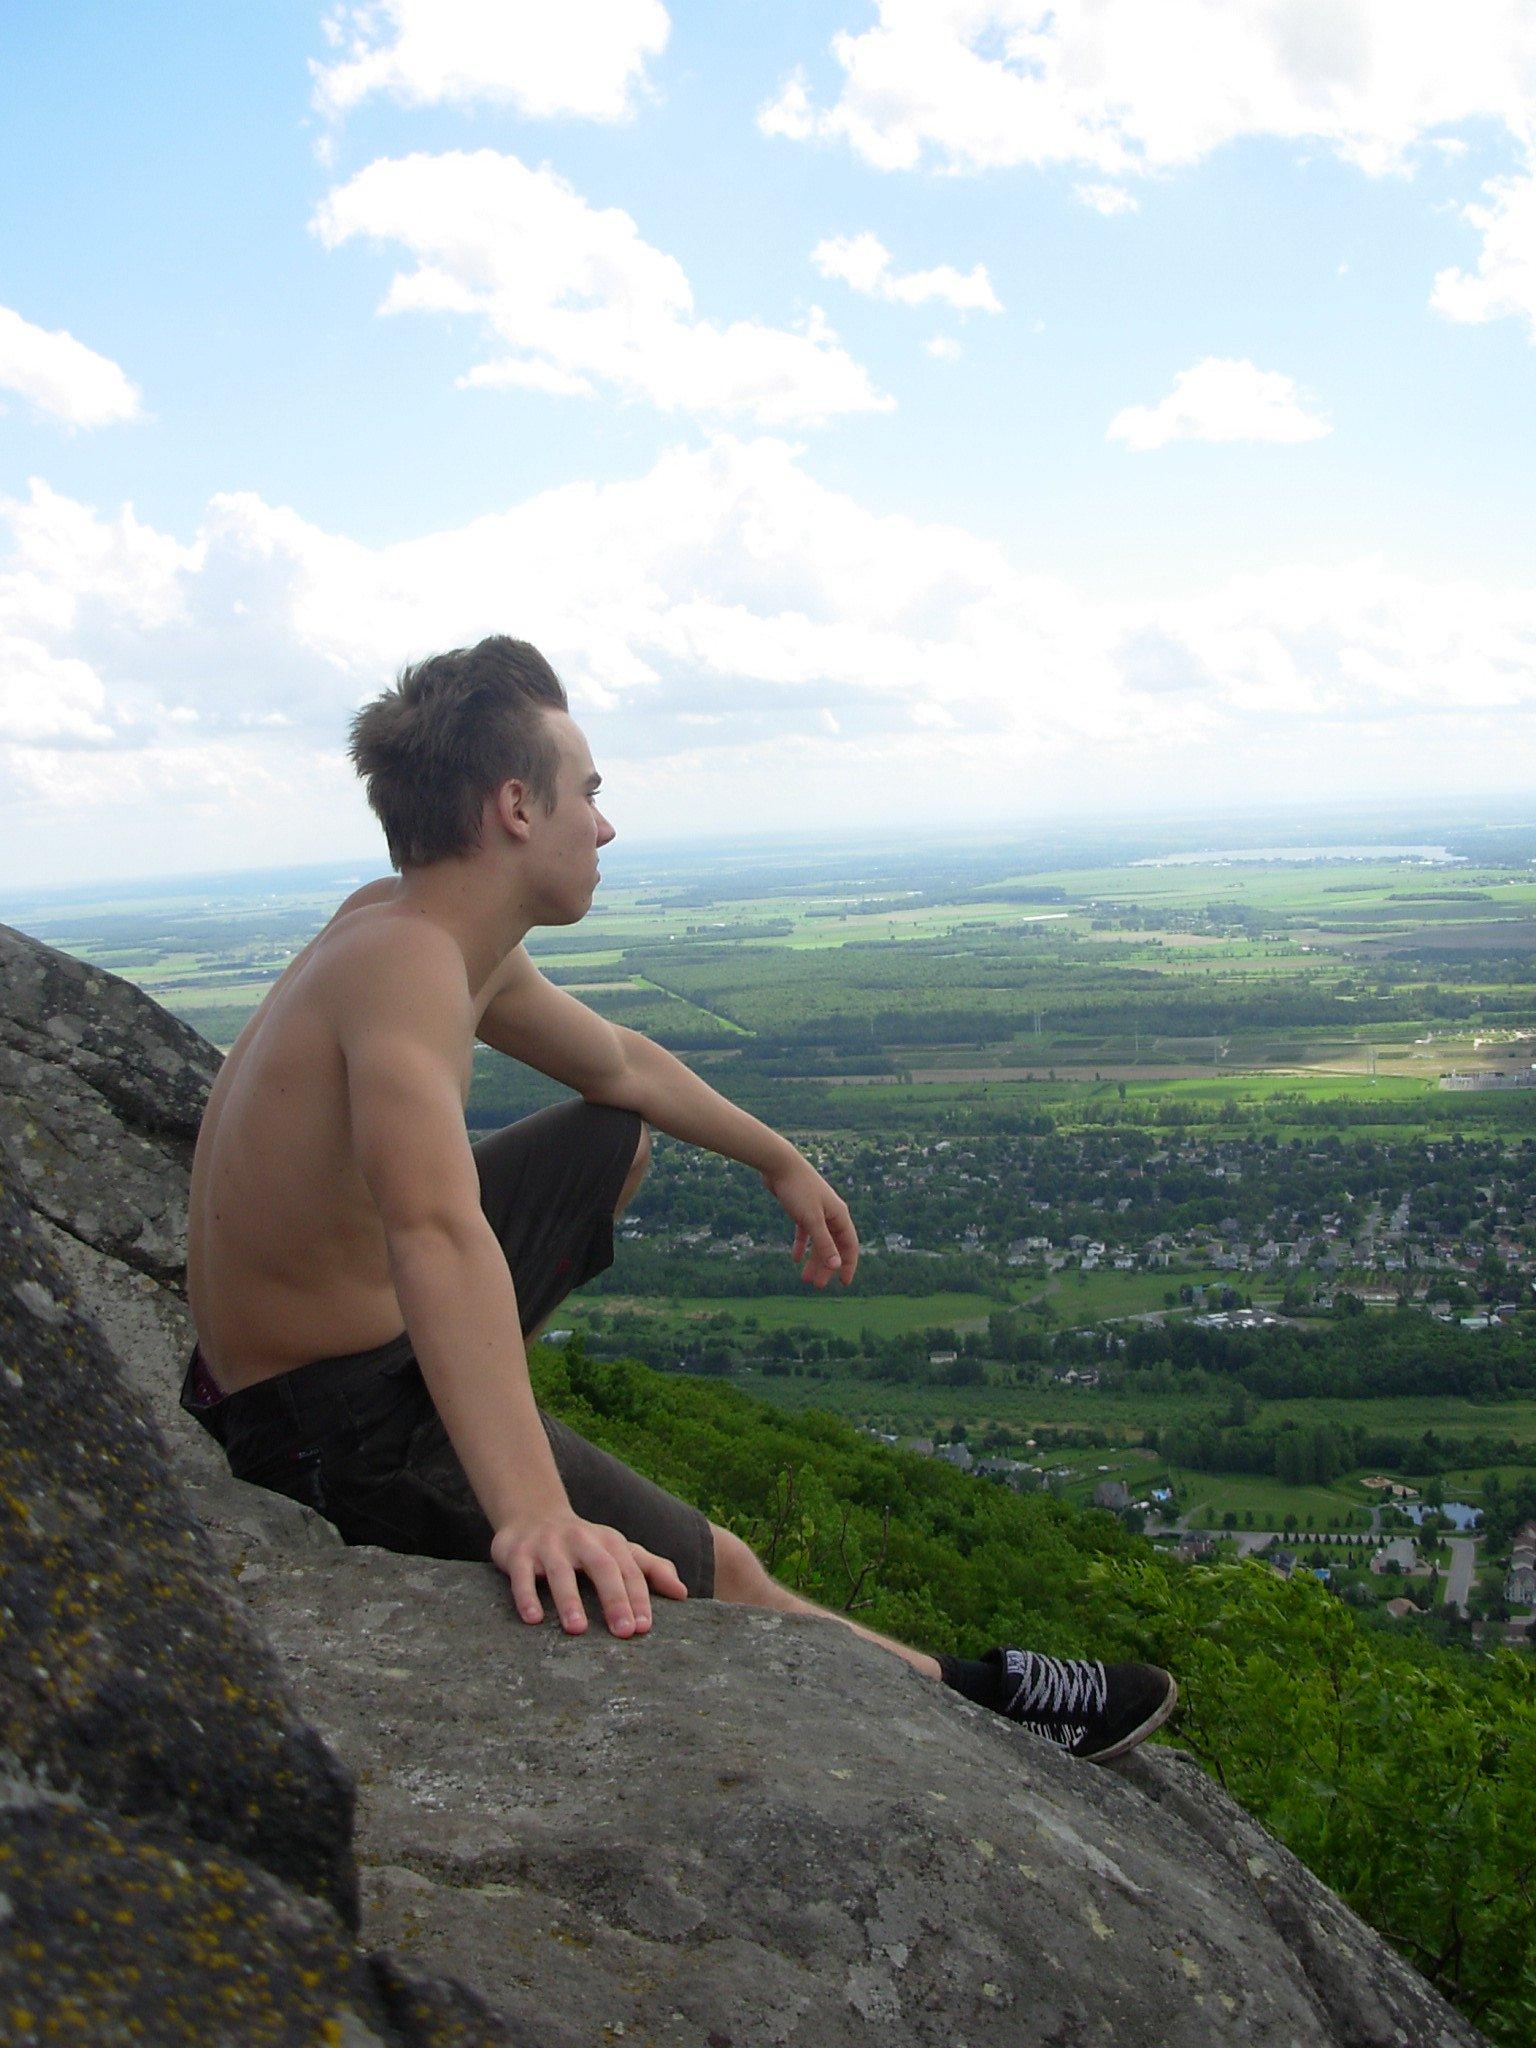 Apreciating the view